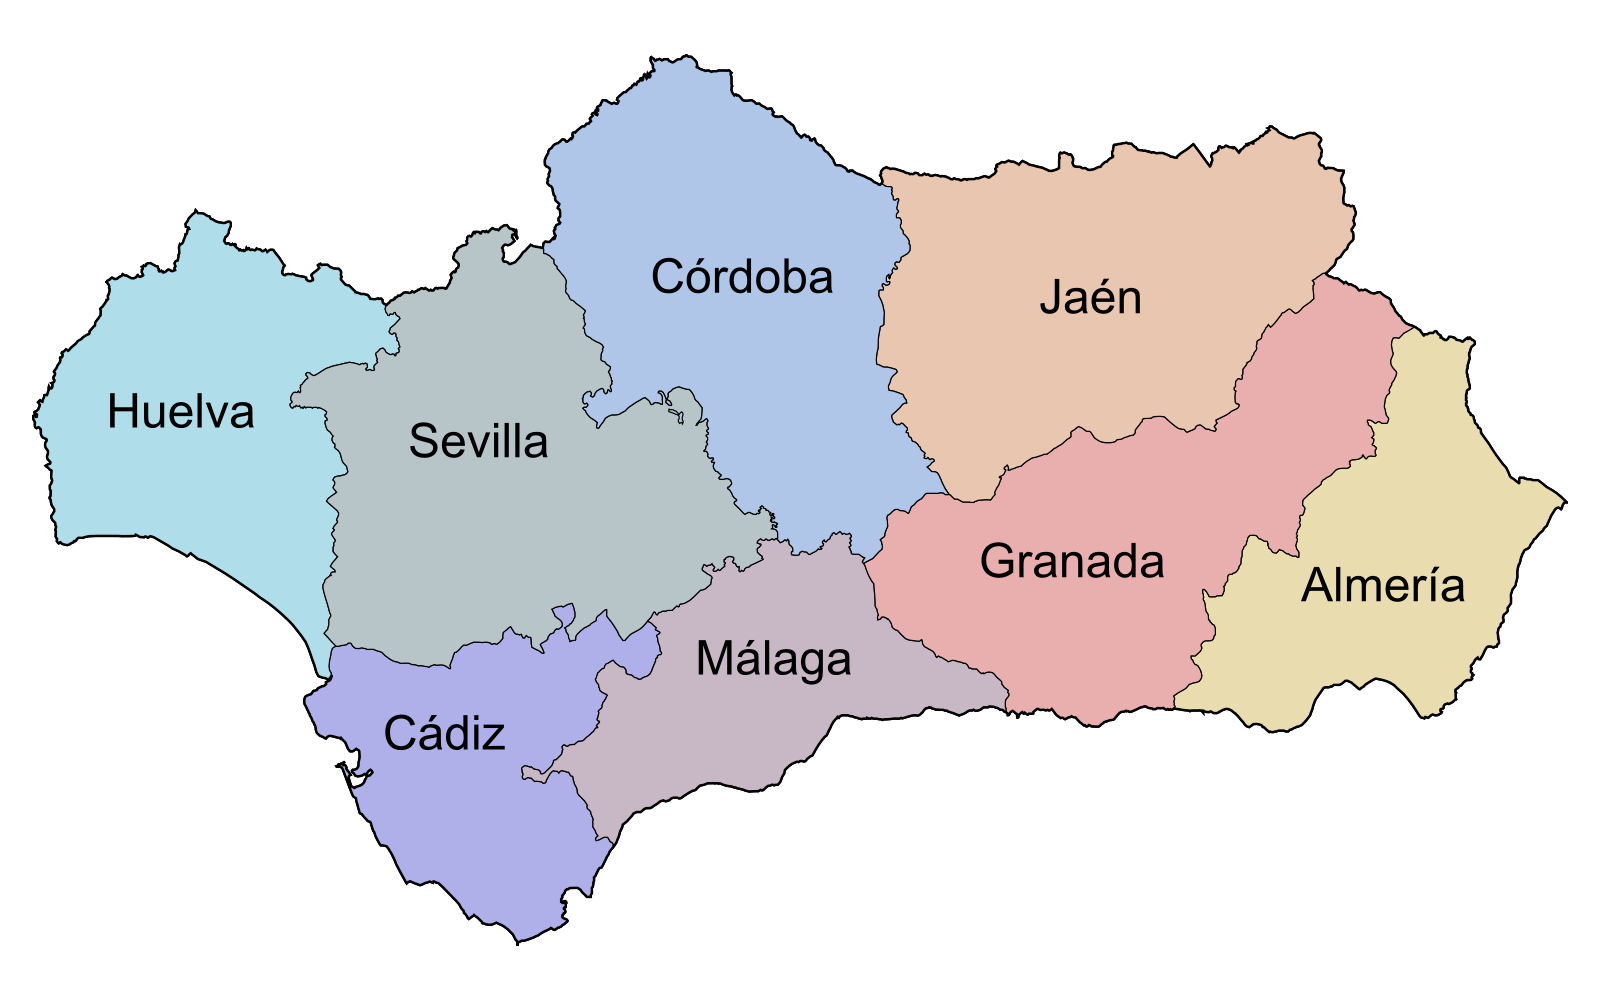 Mapa Mudo Politico De España Para Imprimir Tamaño Folio.Mapas De Espana Para Descargar E Imprimir Completamente